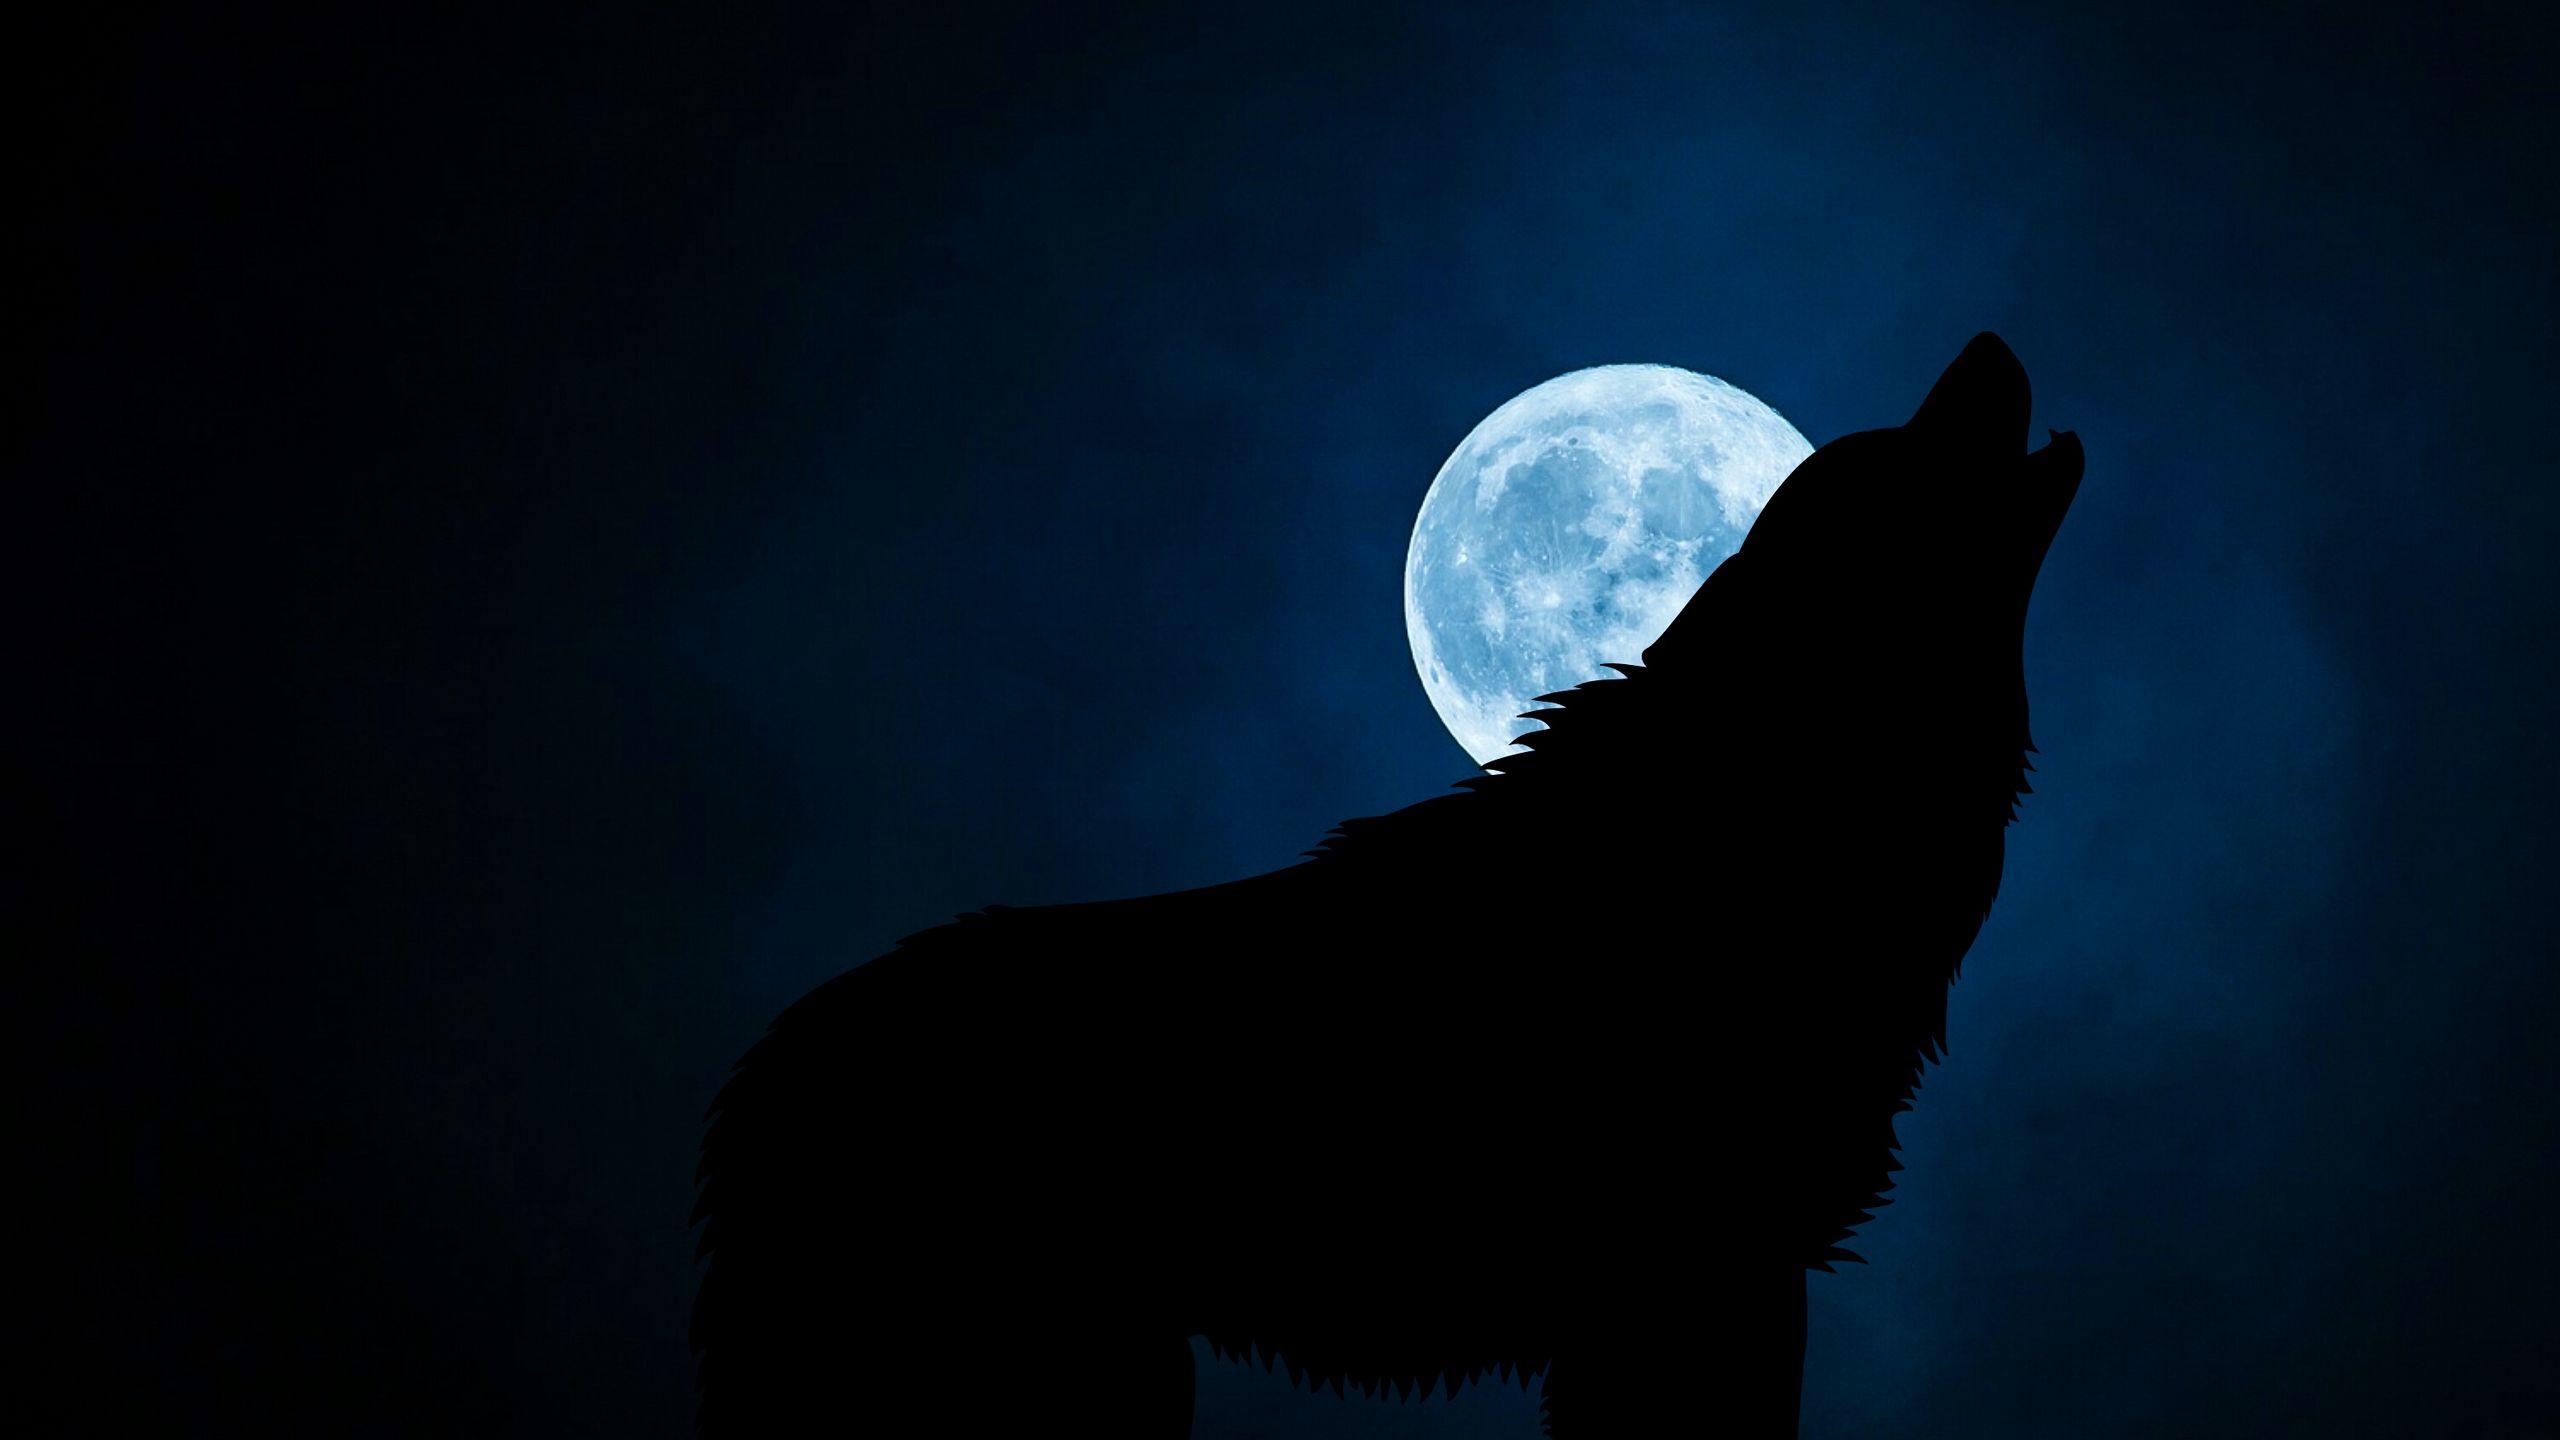 2560x1440 Wallpaper wolf, silhouette, moon, night